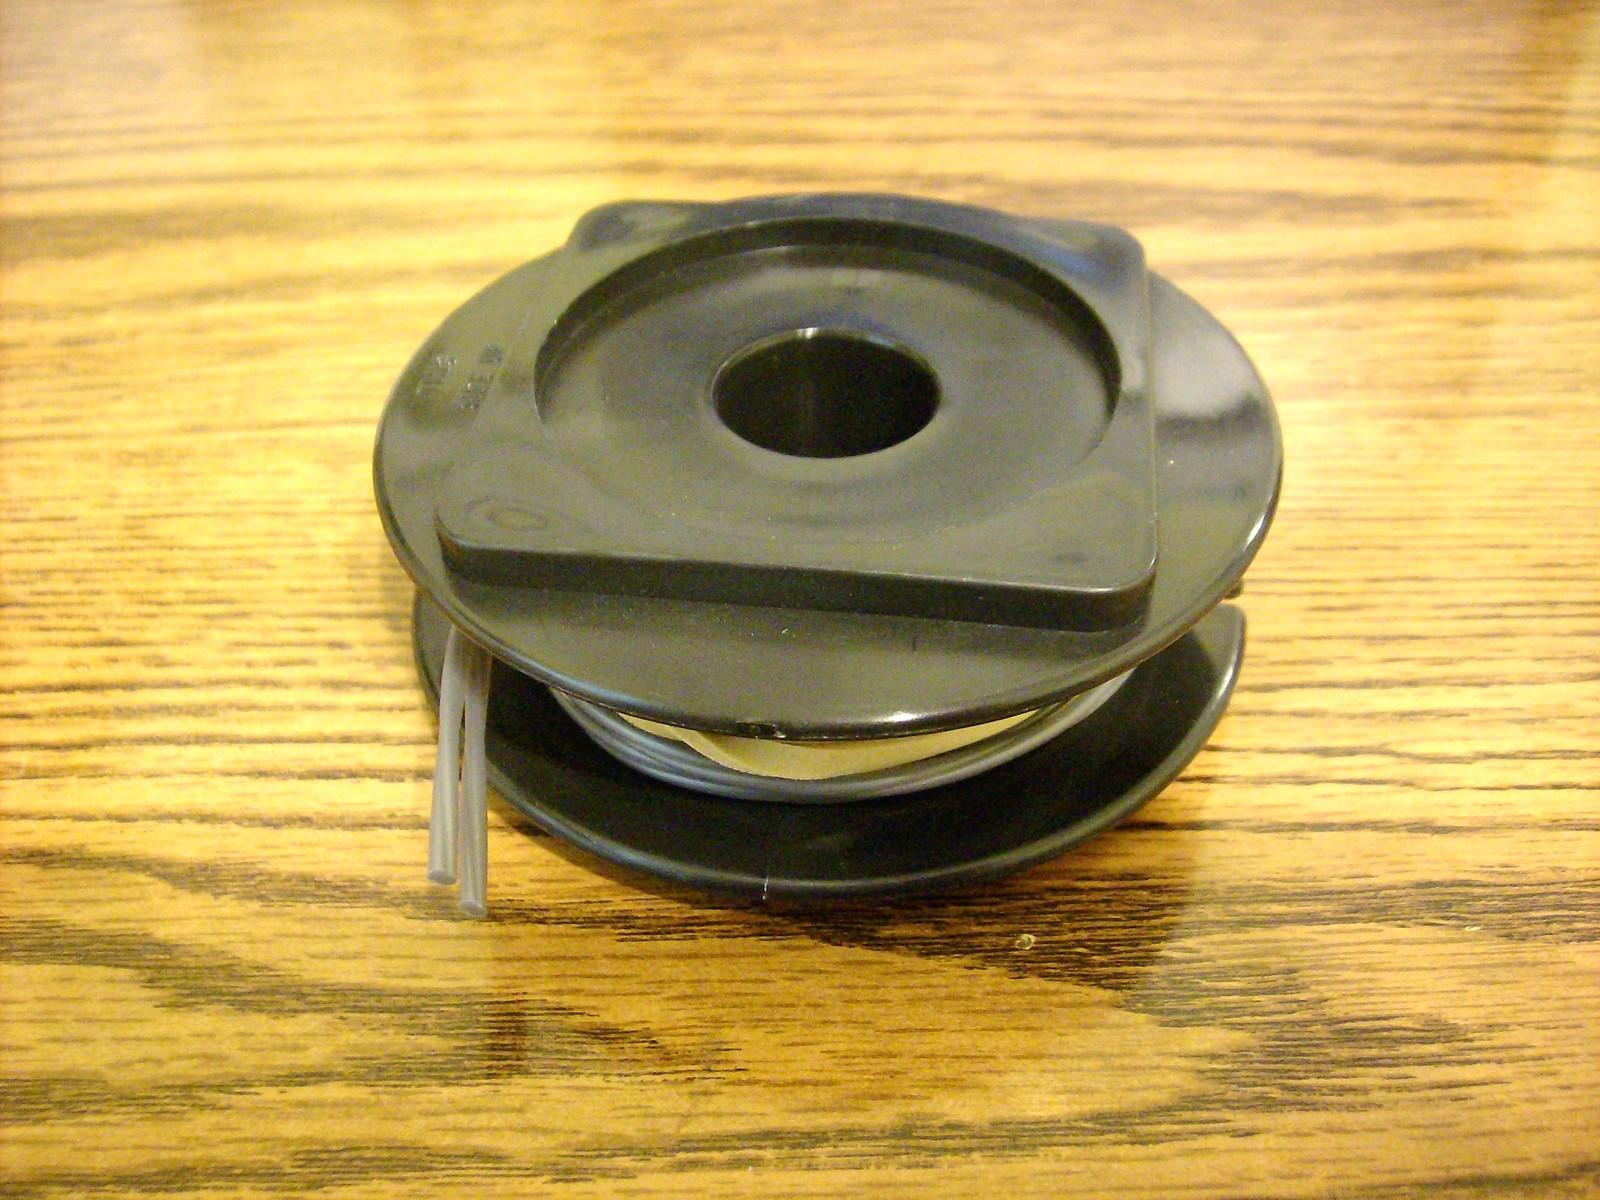 Shindaiwa string trimmer bump head spool 99909-15580 / 9990915580